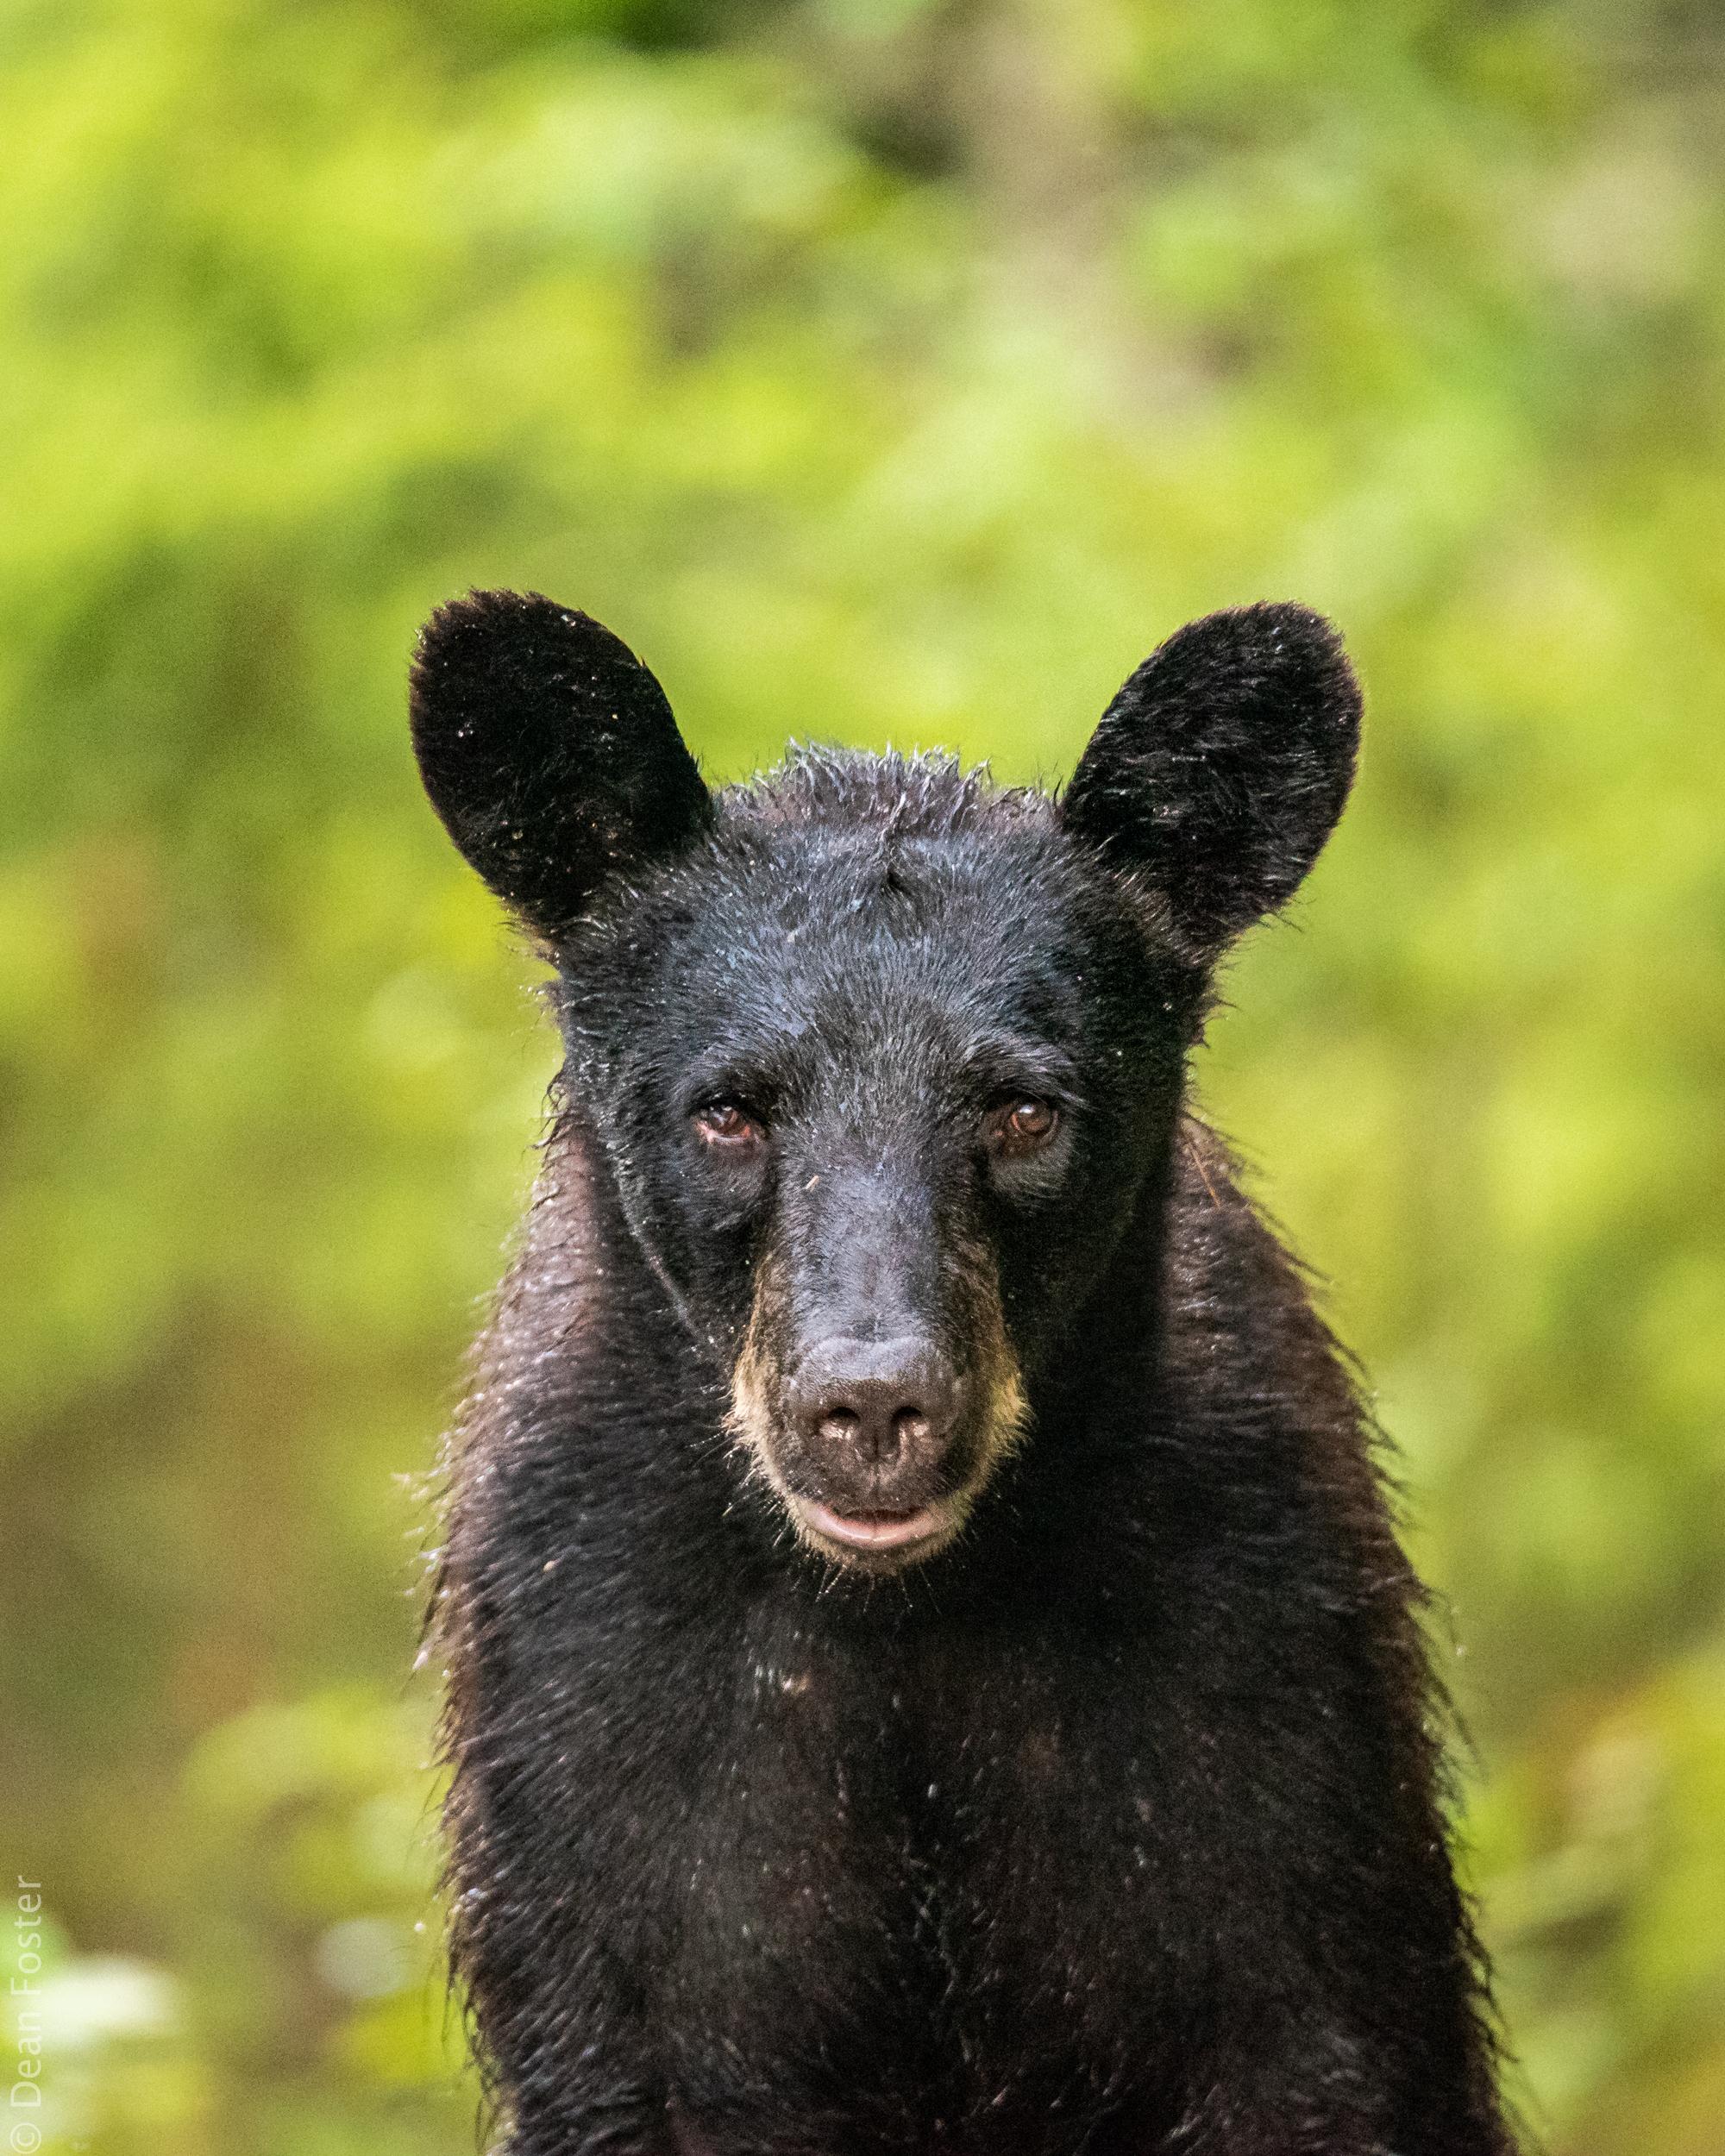 blackbear-4747.jpg